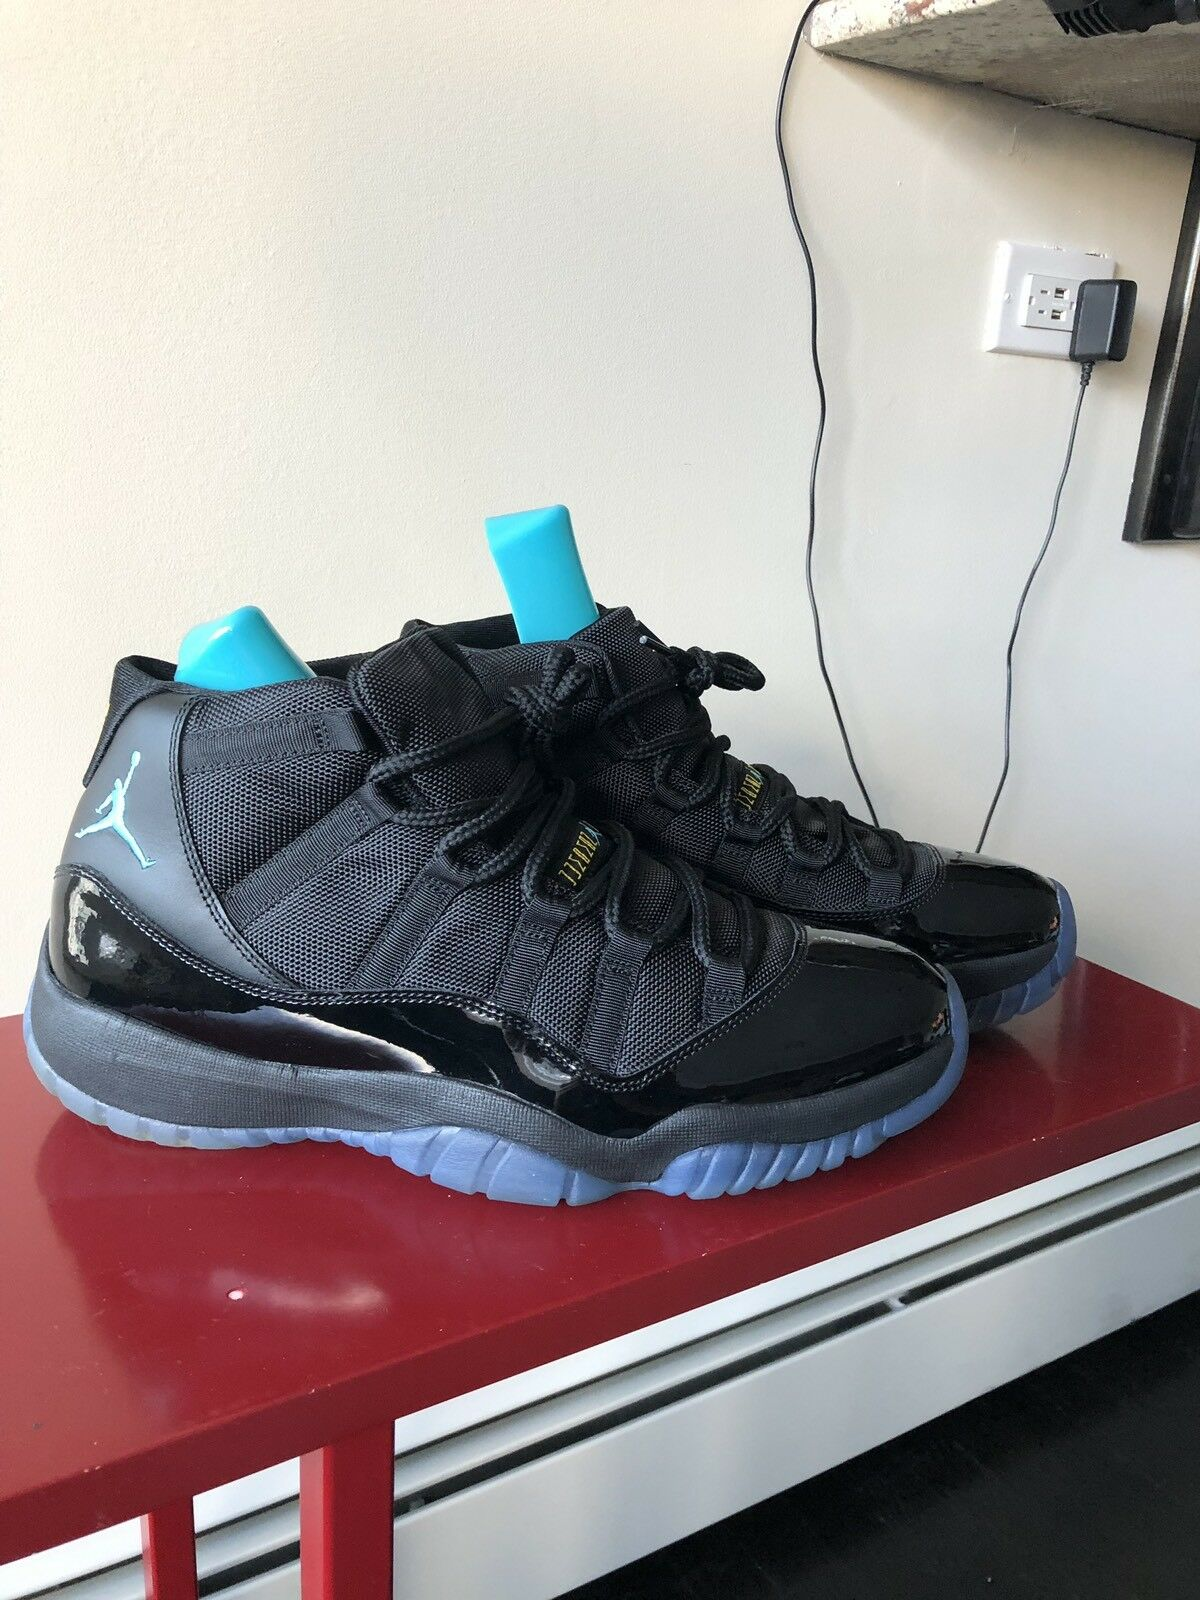 Nike Mens Air Jordan 11 Retro Black Gamma bluee Size 12